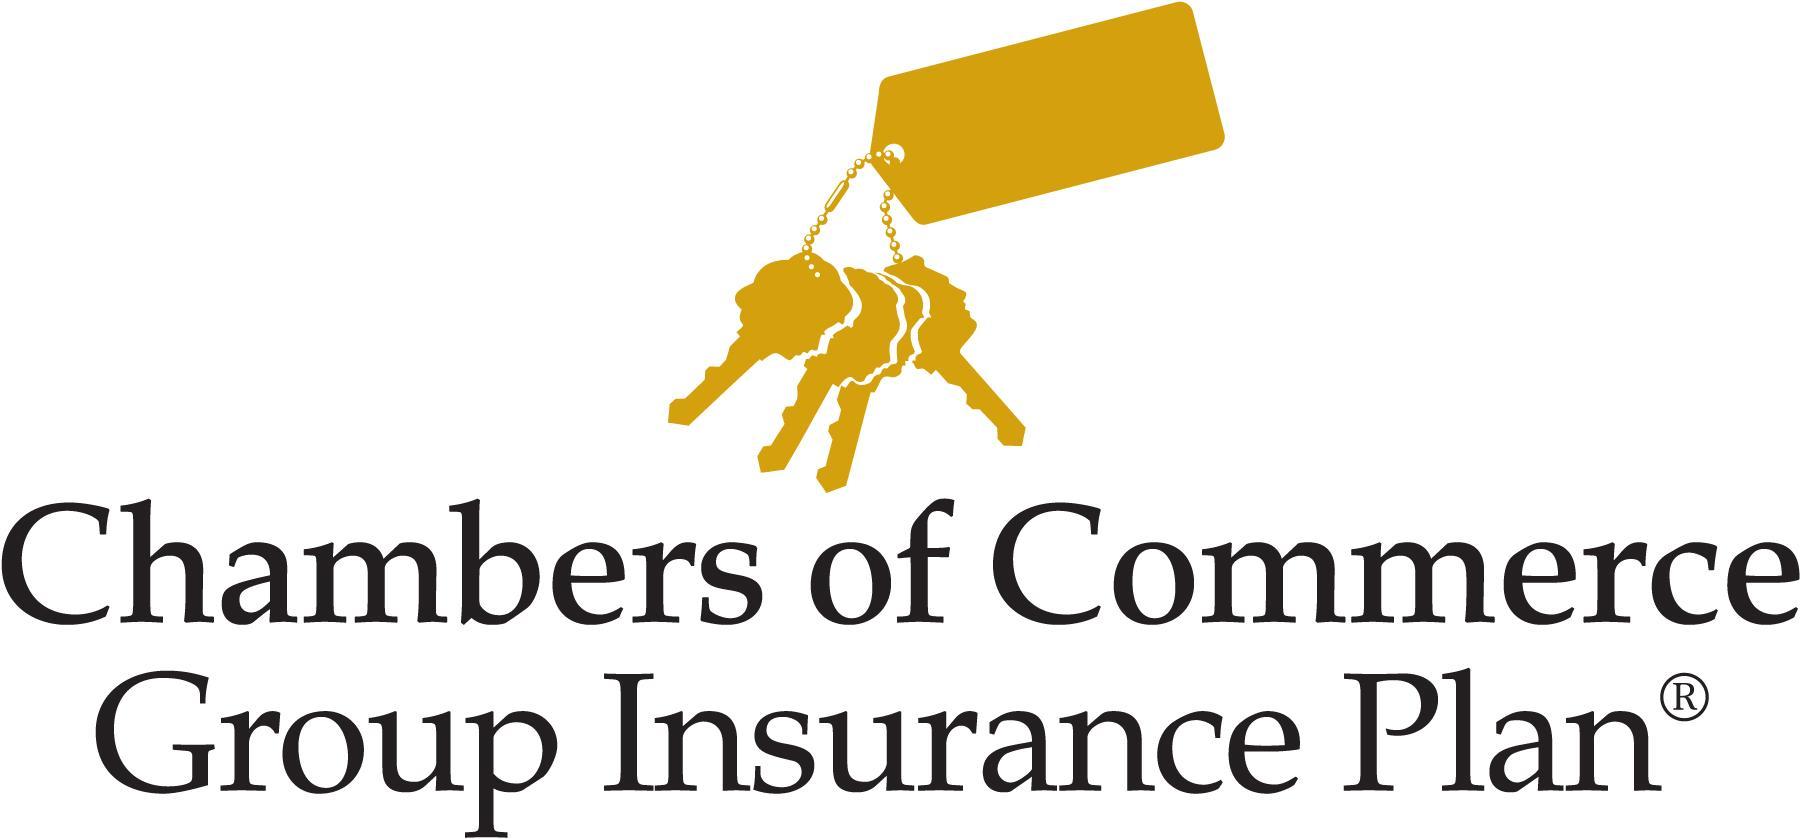 chambers-plan-logo